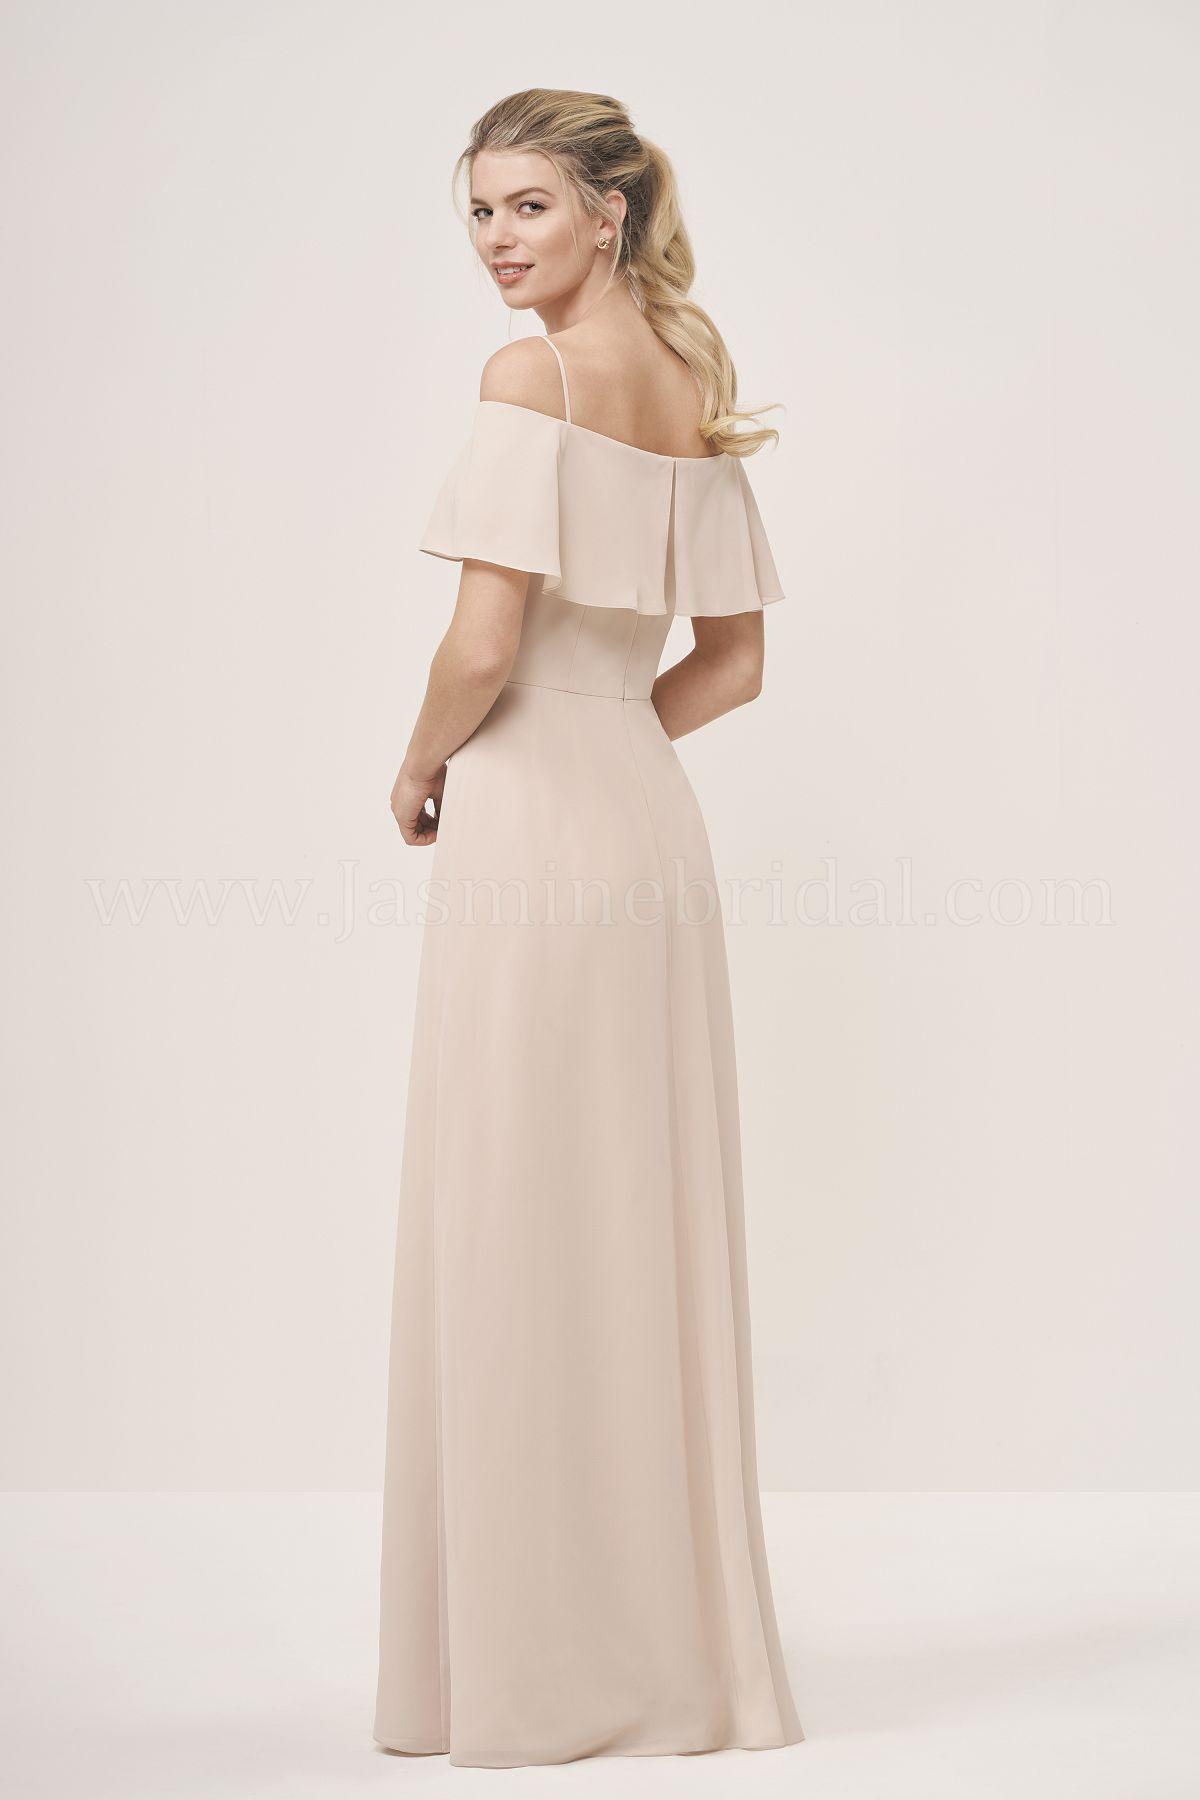 bridesmaid-dresses-P196056-B